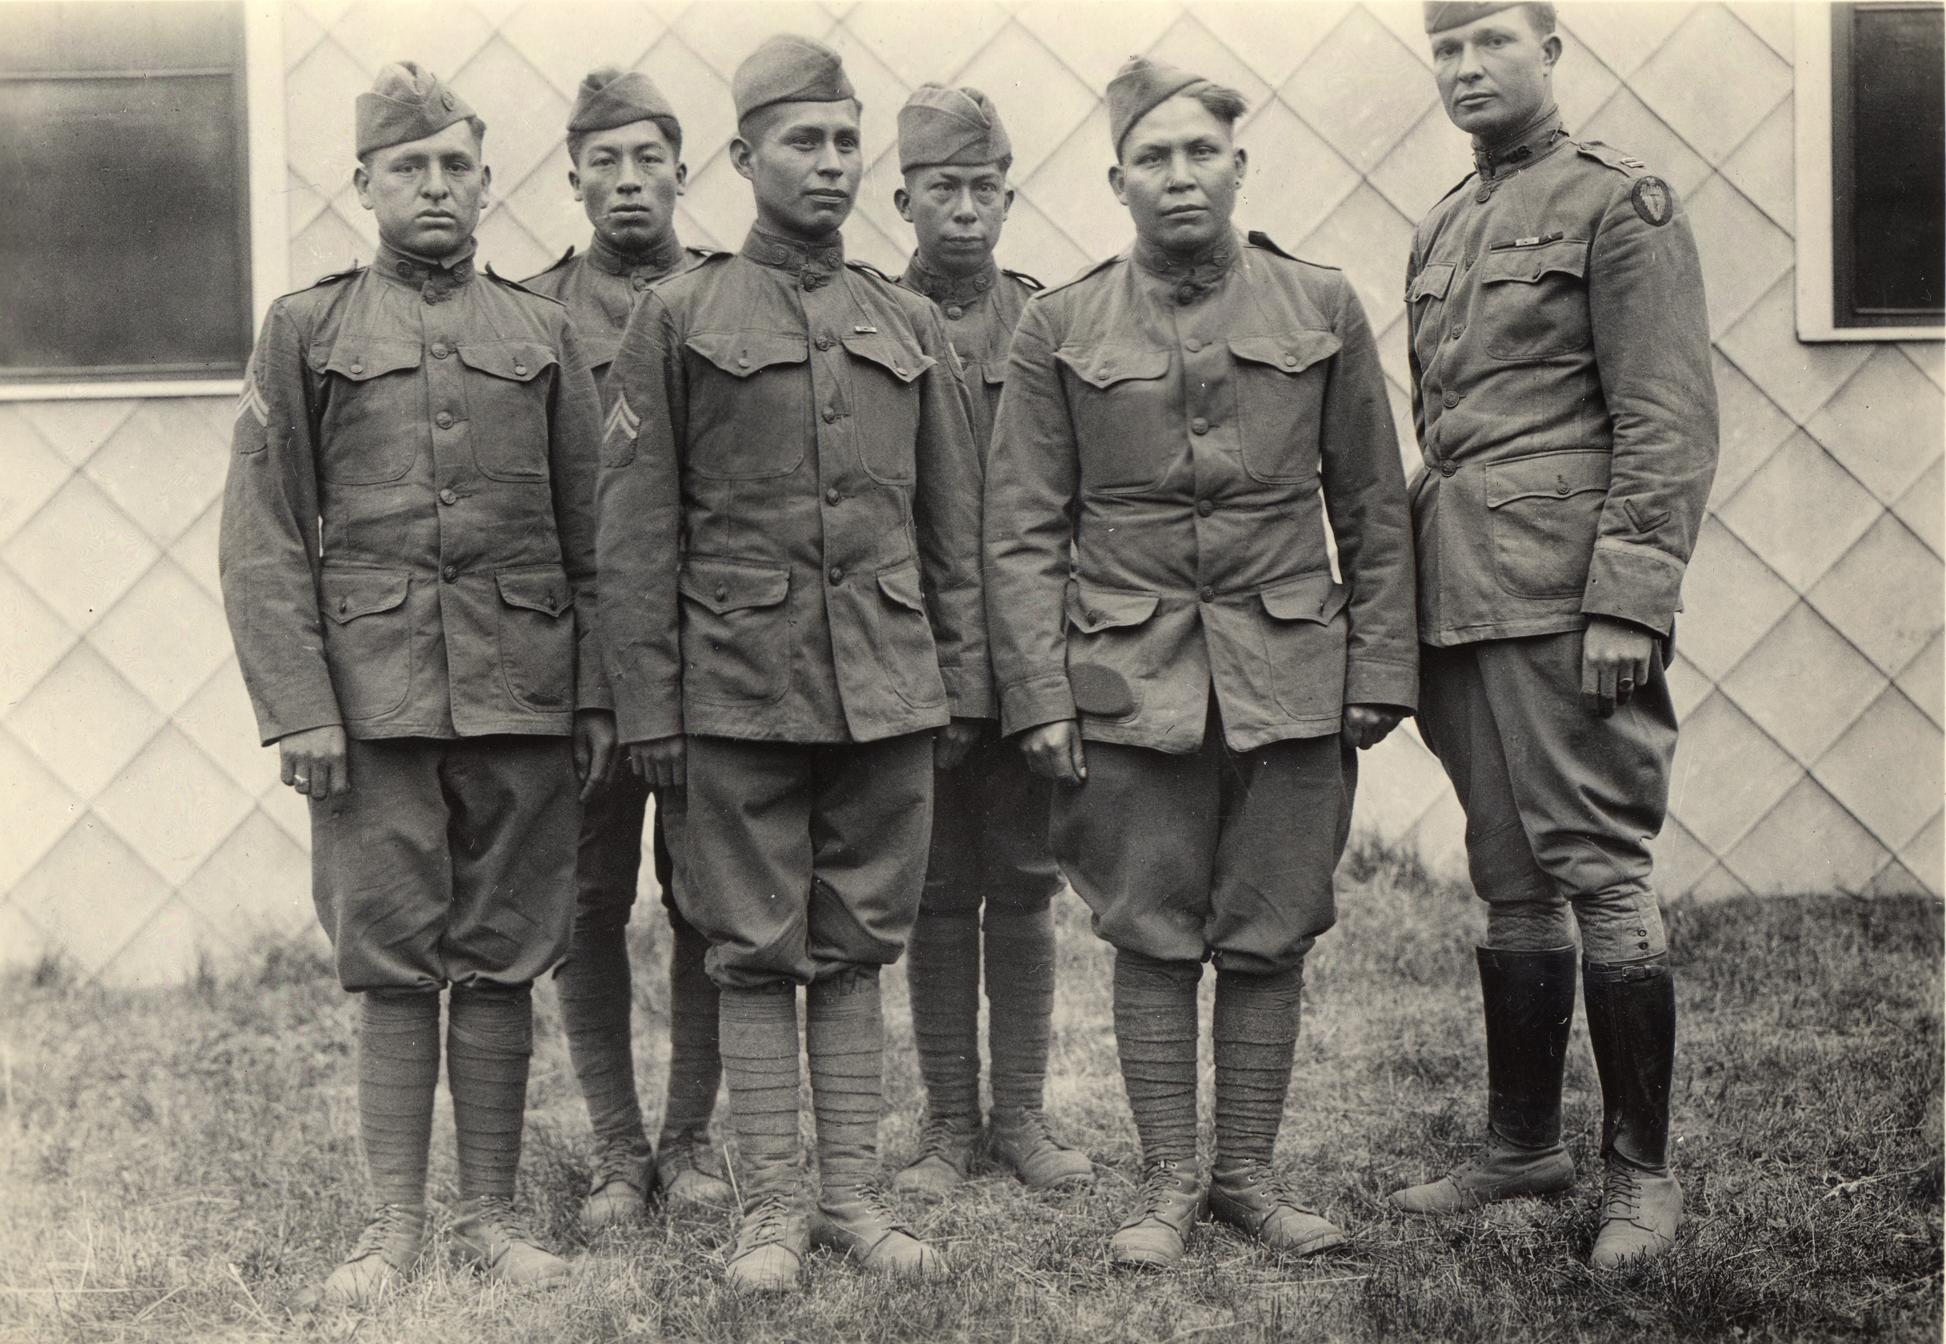 From L to R:Corp. Solomon Bond Louis, Mitchell Bobb, Calvin Wilson, Corp. James M.Edwards, Joseph Davenport,Capt.E.W.Horner (commanding officer)